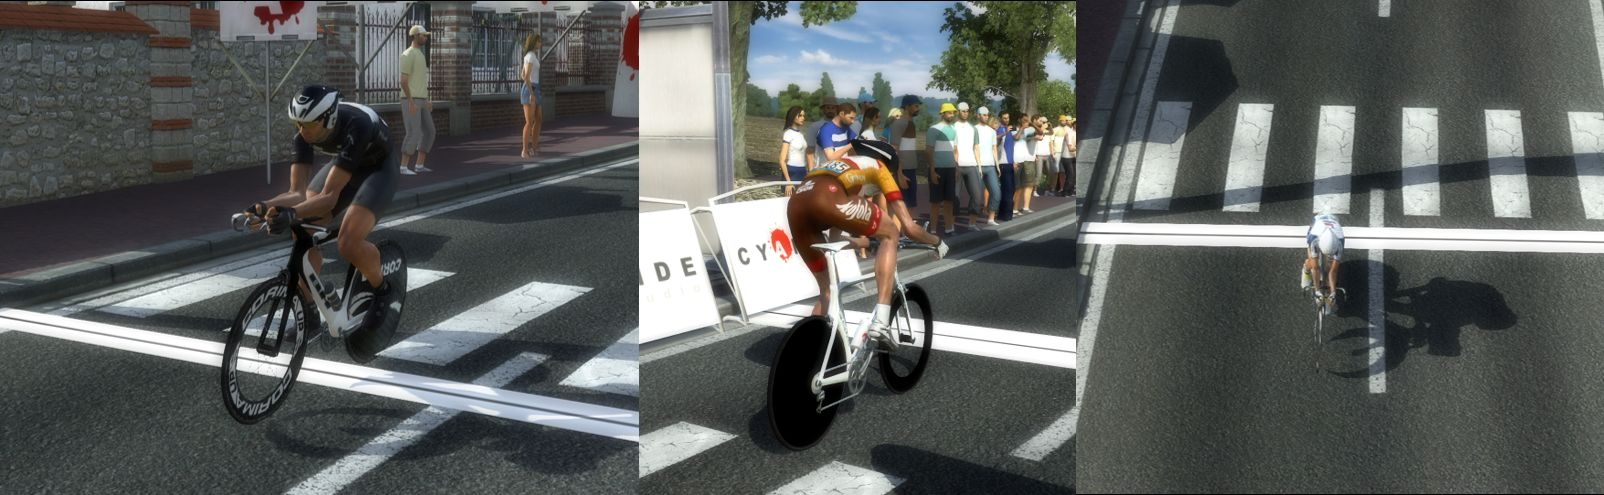 pcmdaily.com/images/mg/2019/Races/C1/Bayern/S4/mg19_bay_s04_15.jpg